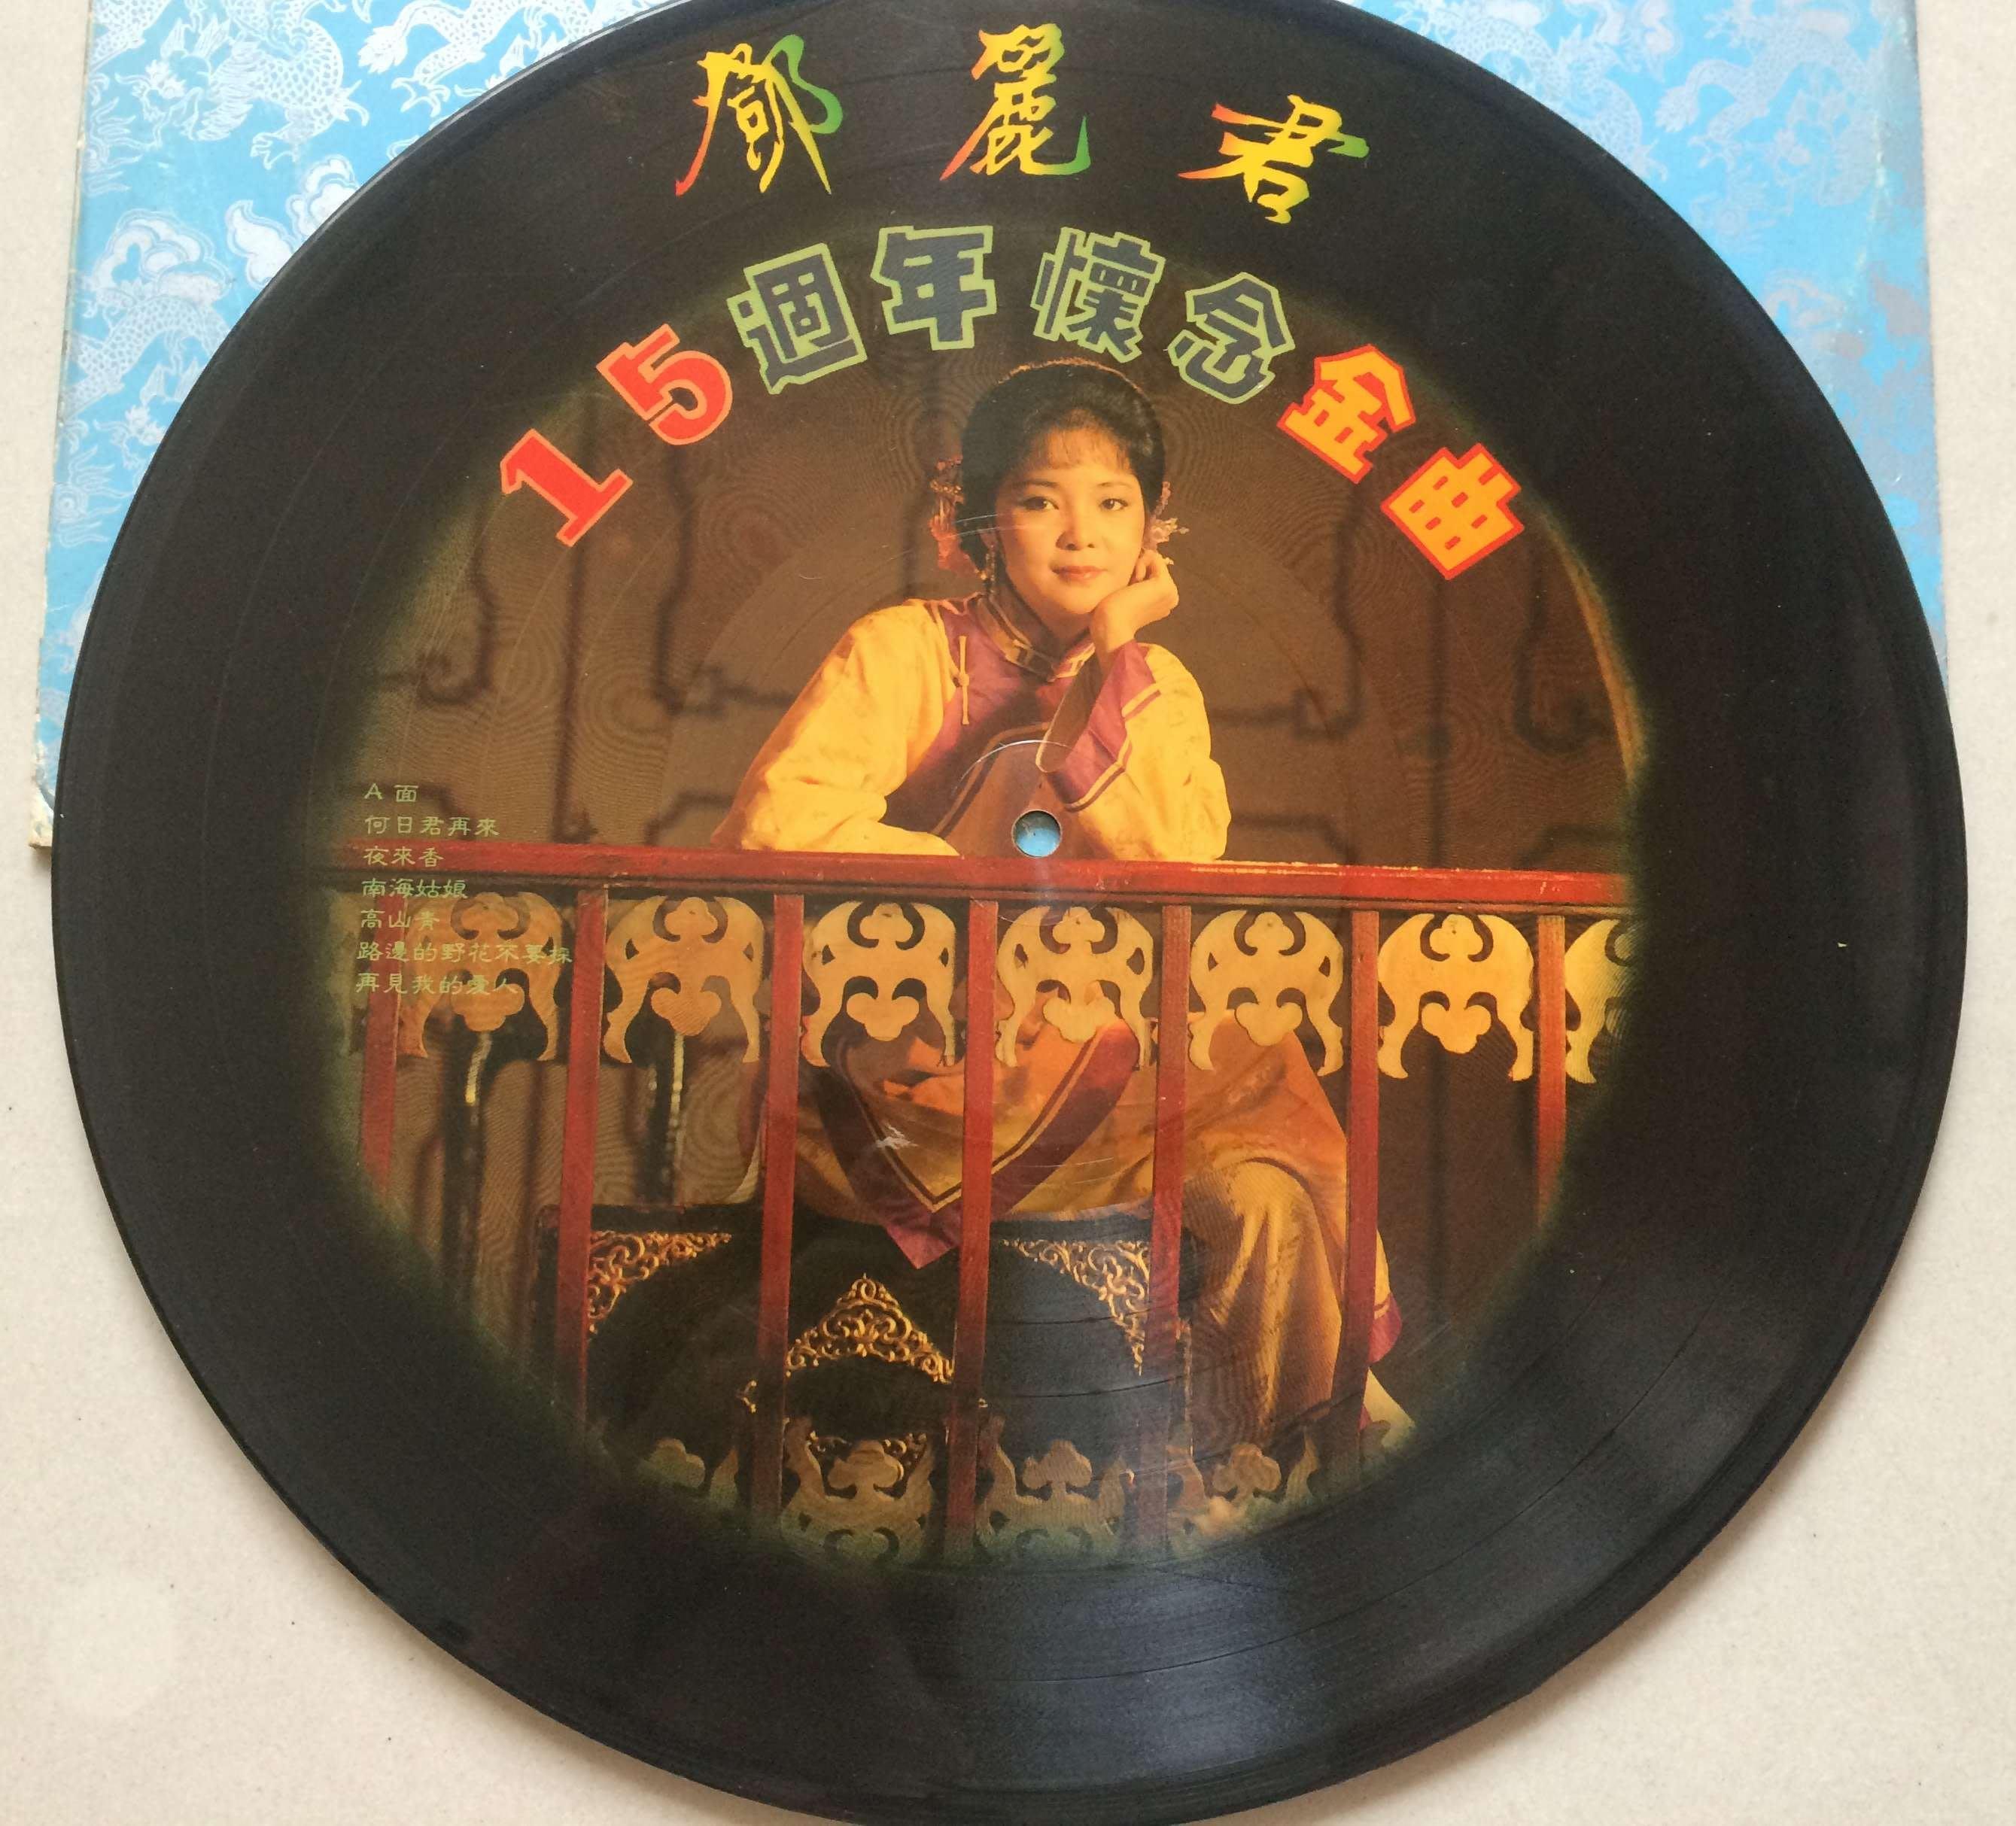 Ω古樂閣Ω~黑膠唱片…鄧麗君…15週年懷念金曲…何日君再來,彩膠唱片